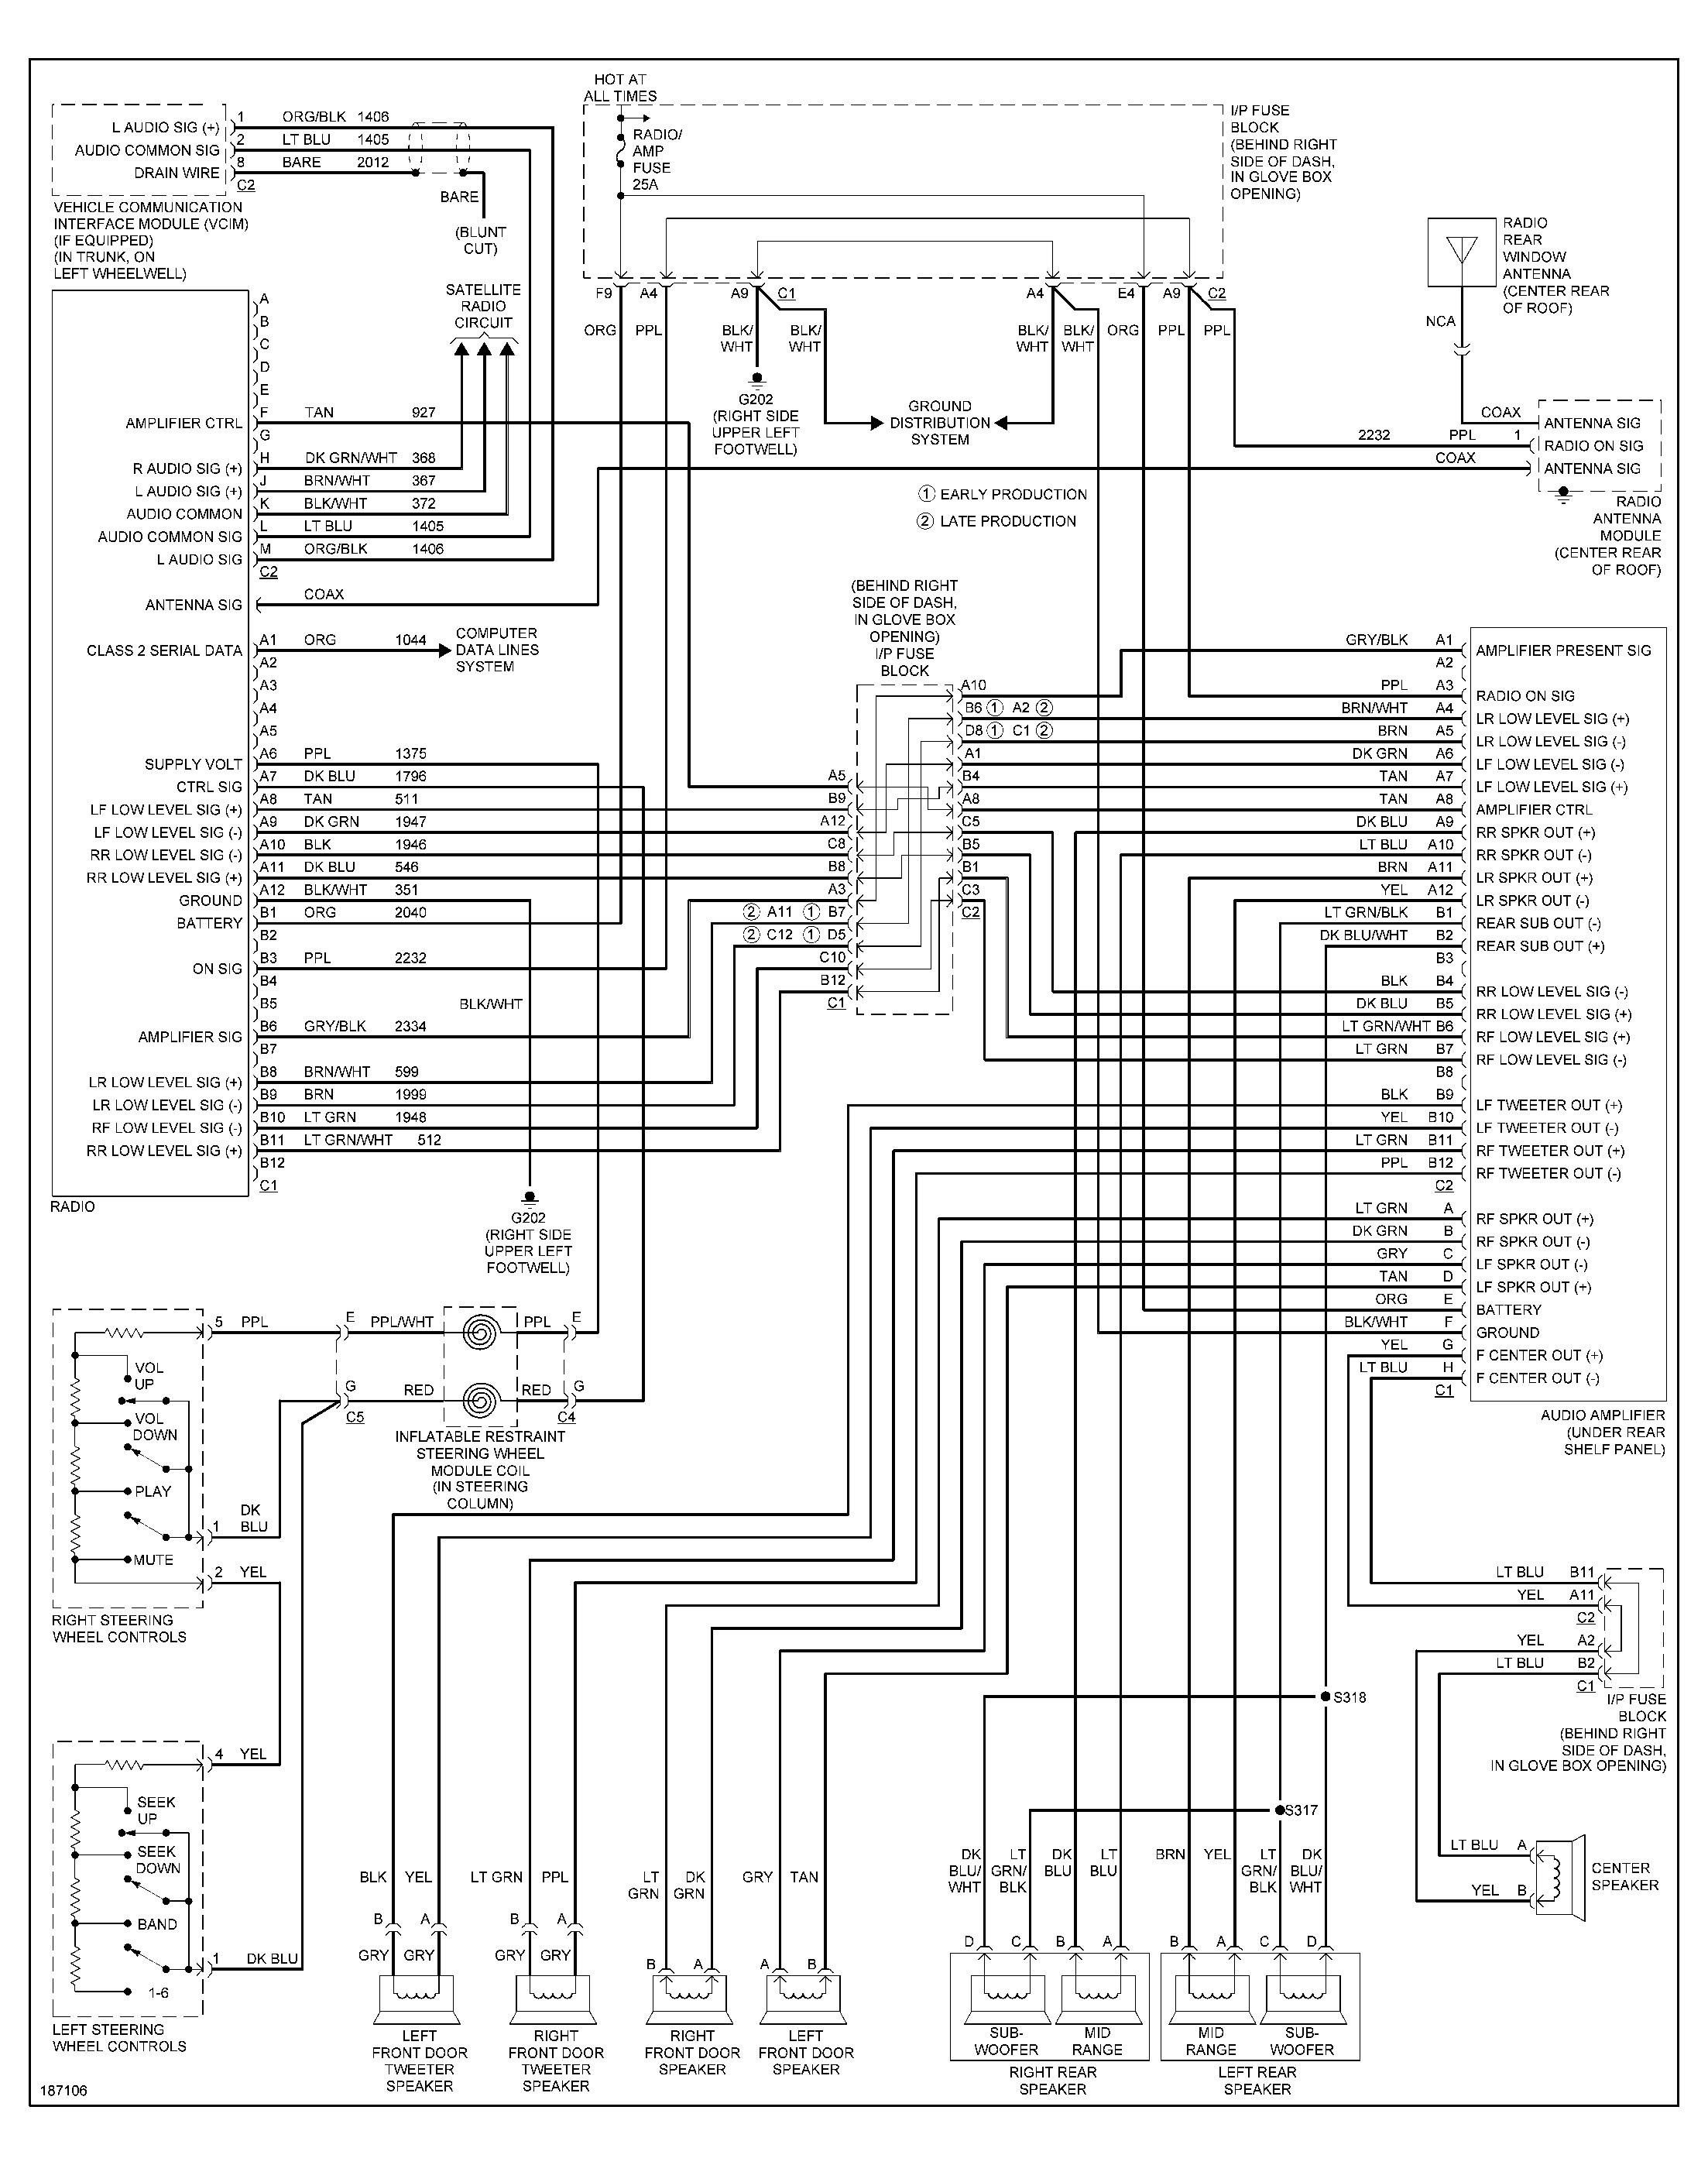 2003 Hyundai Santum Fe Wiring Diagram